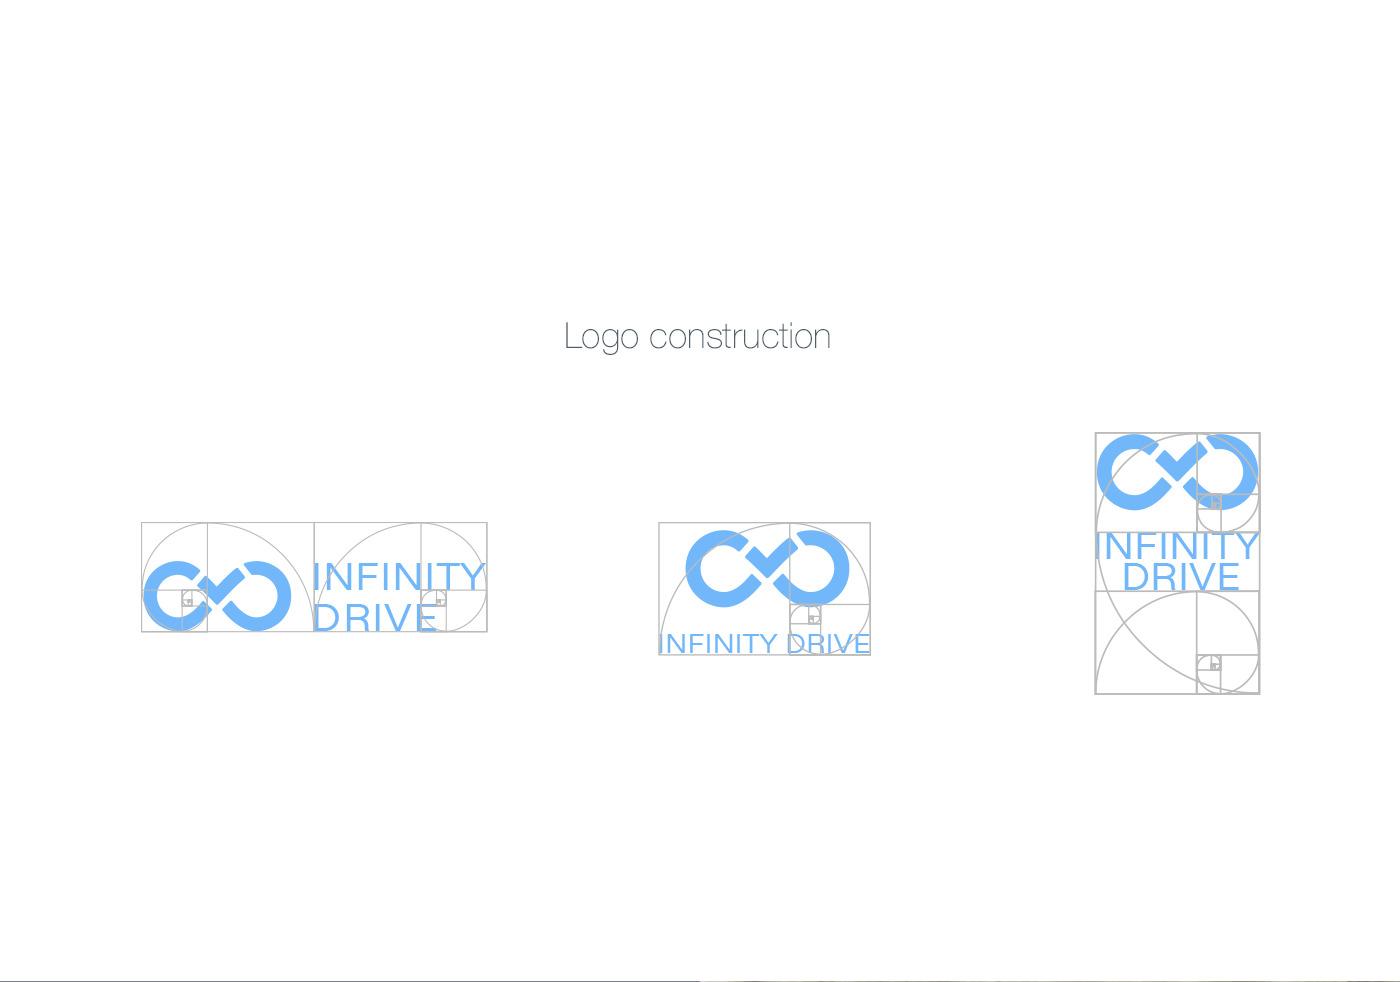 infinity drive logo construction